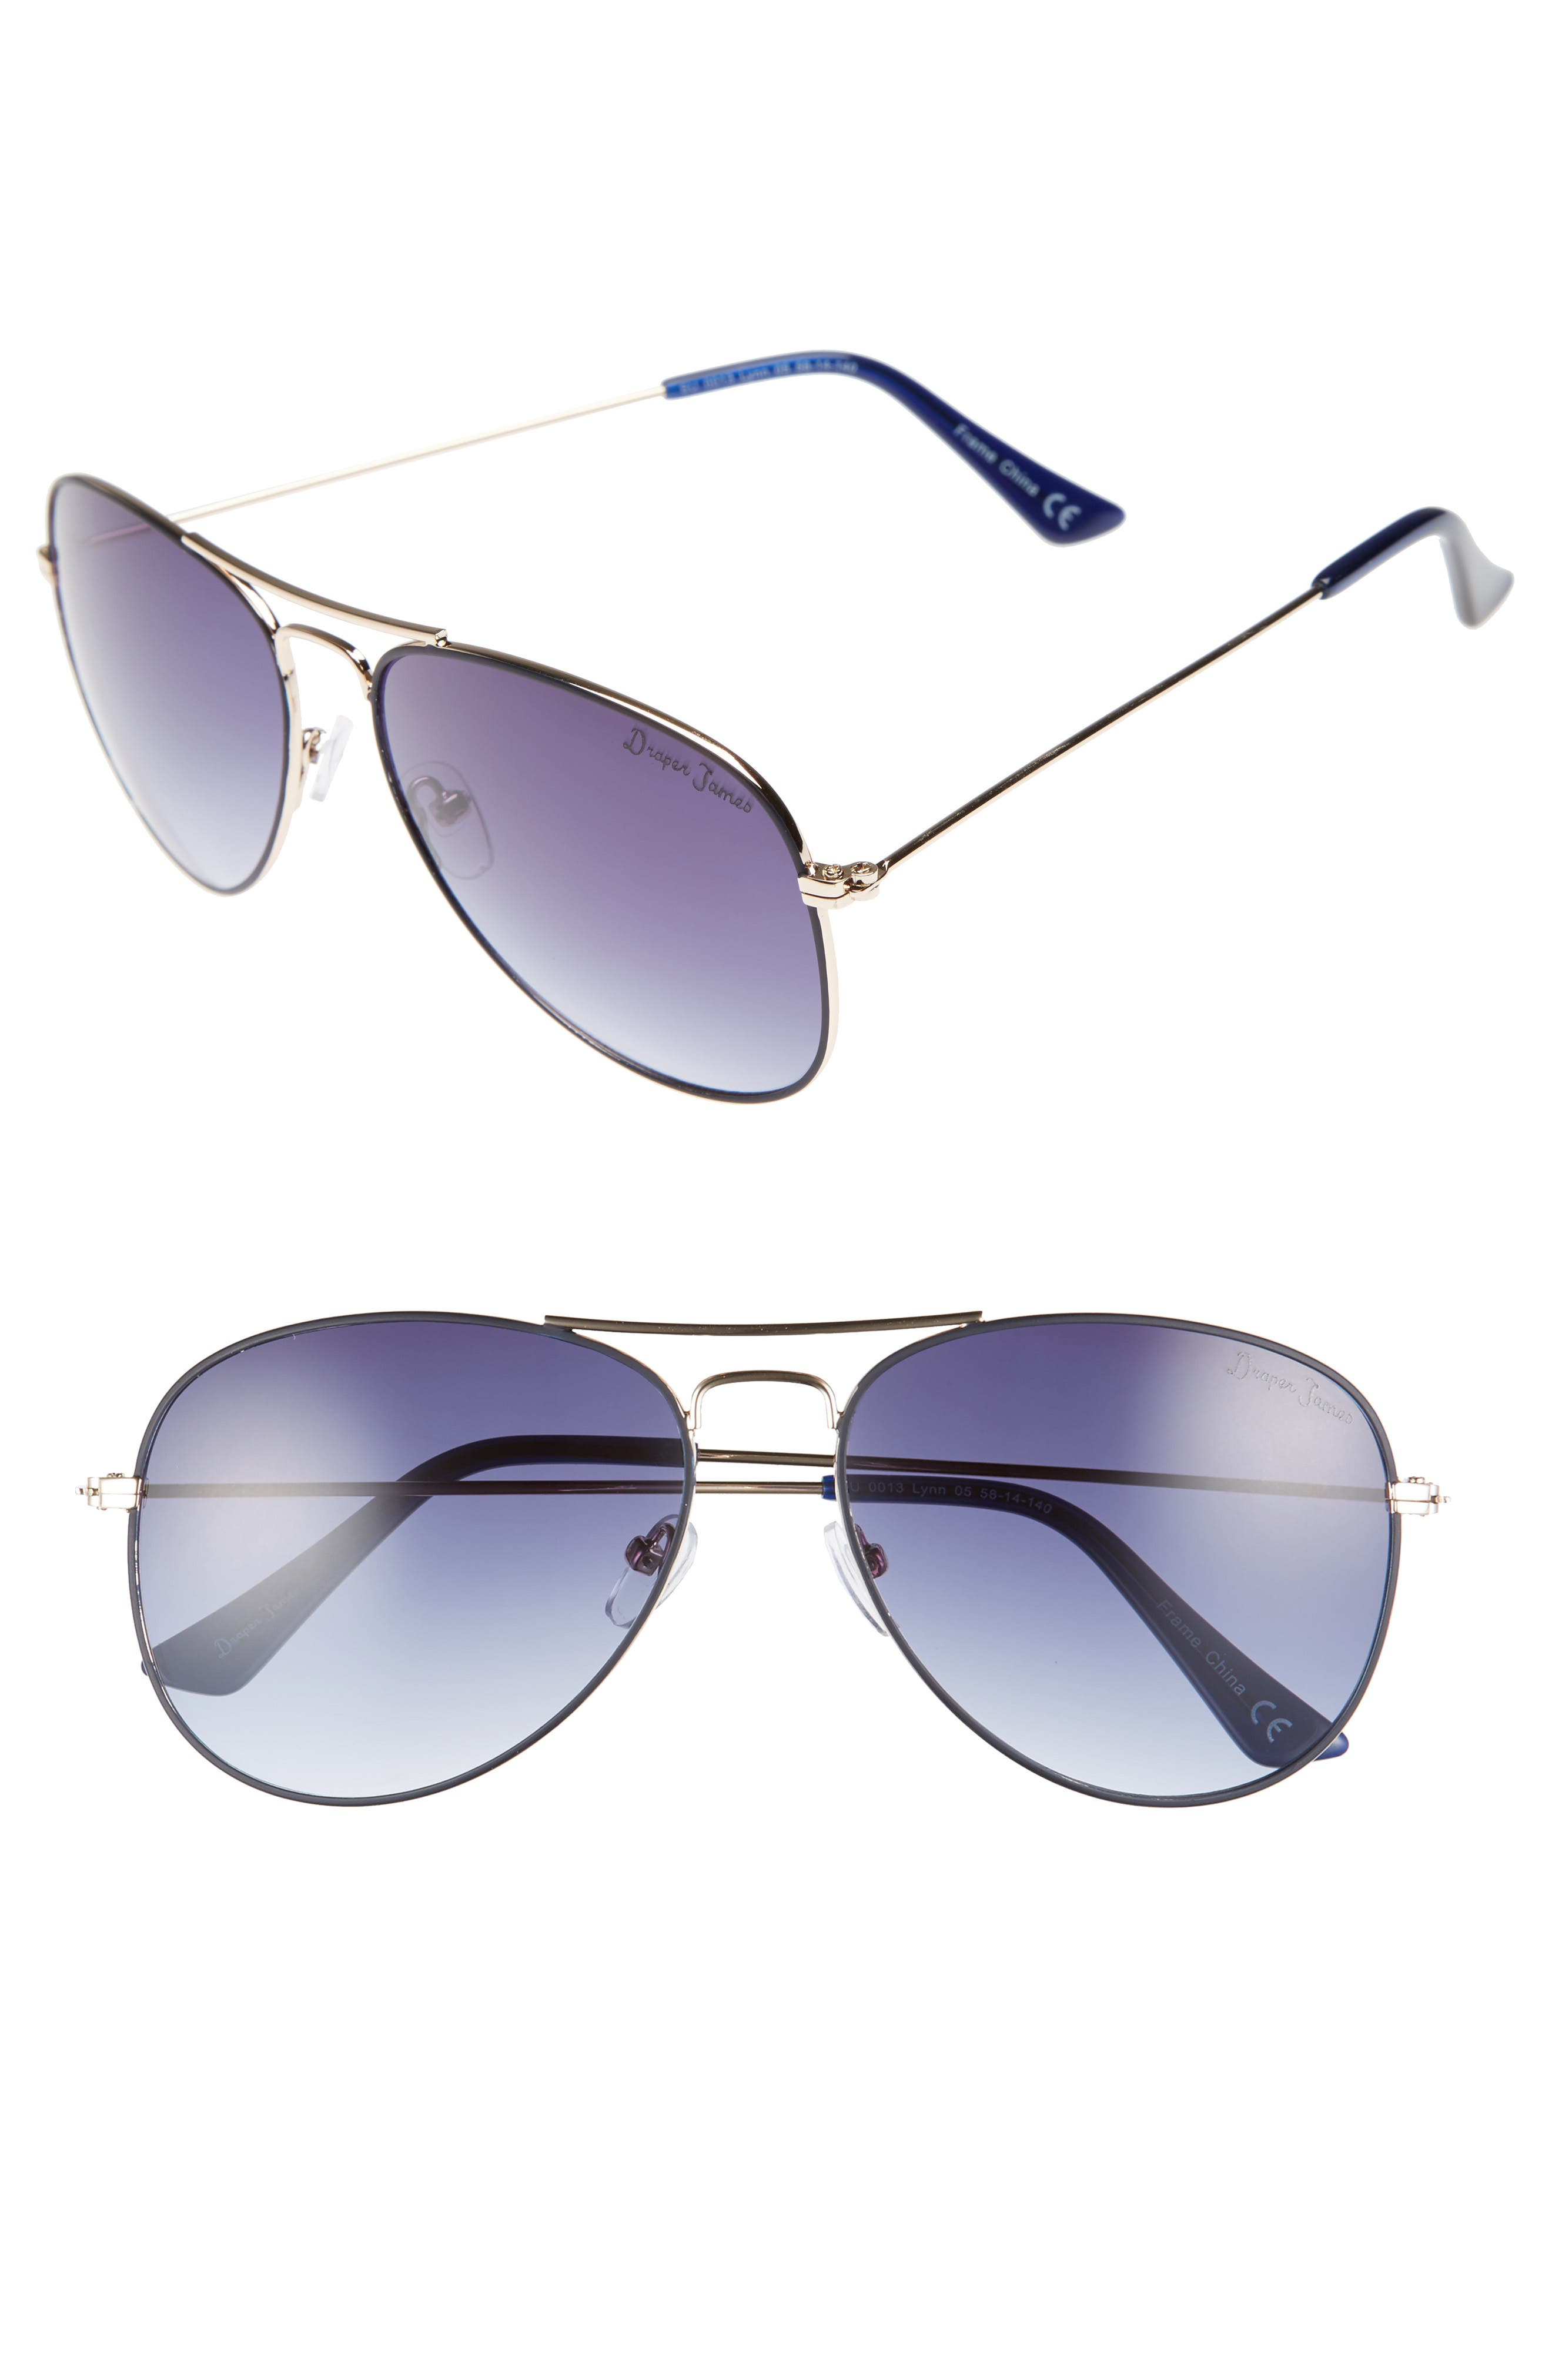 Main Image - Draper James 58mm Gradient Aviator Sunglasses